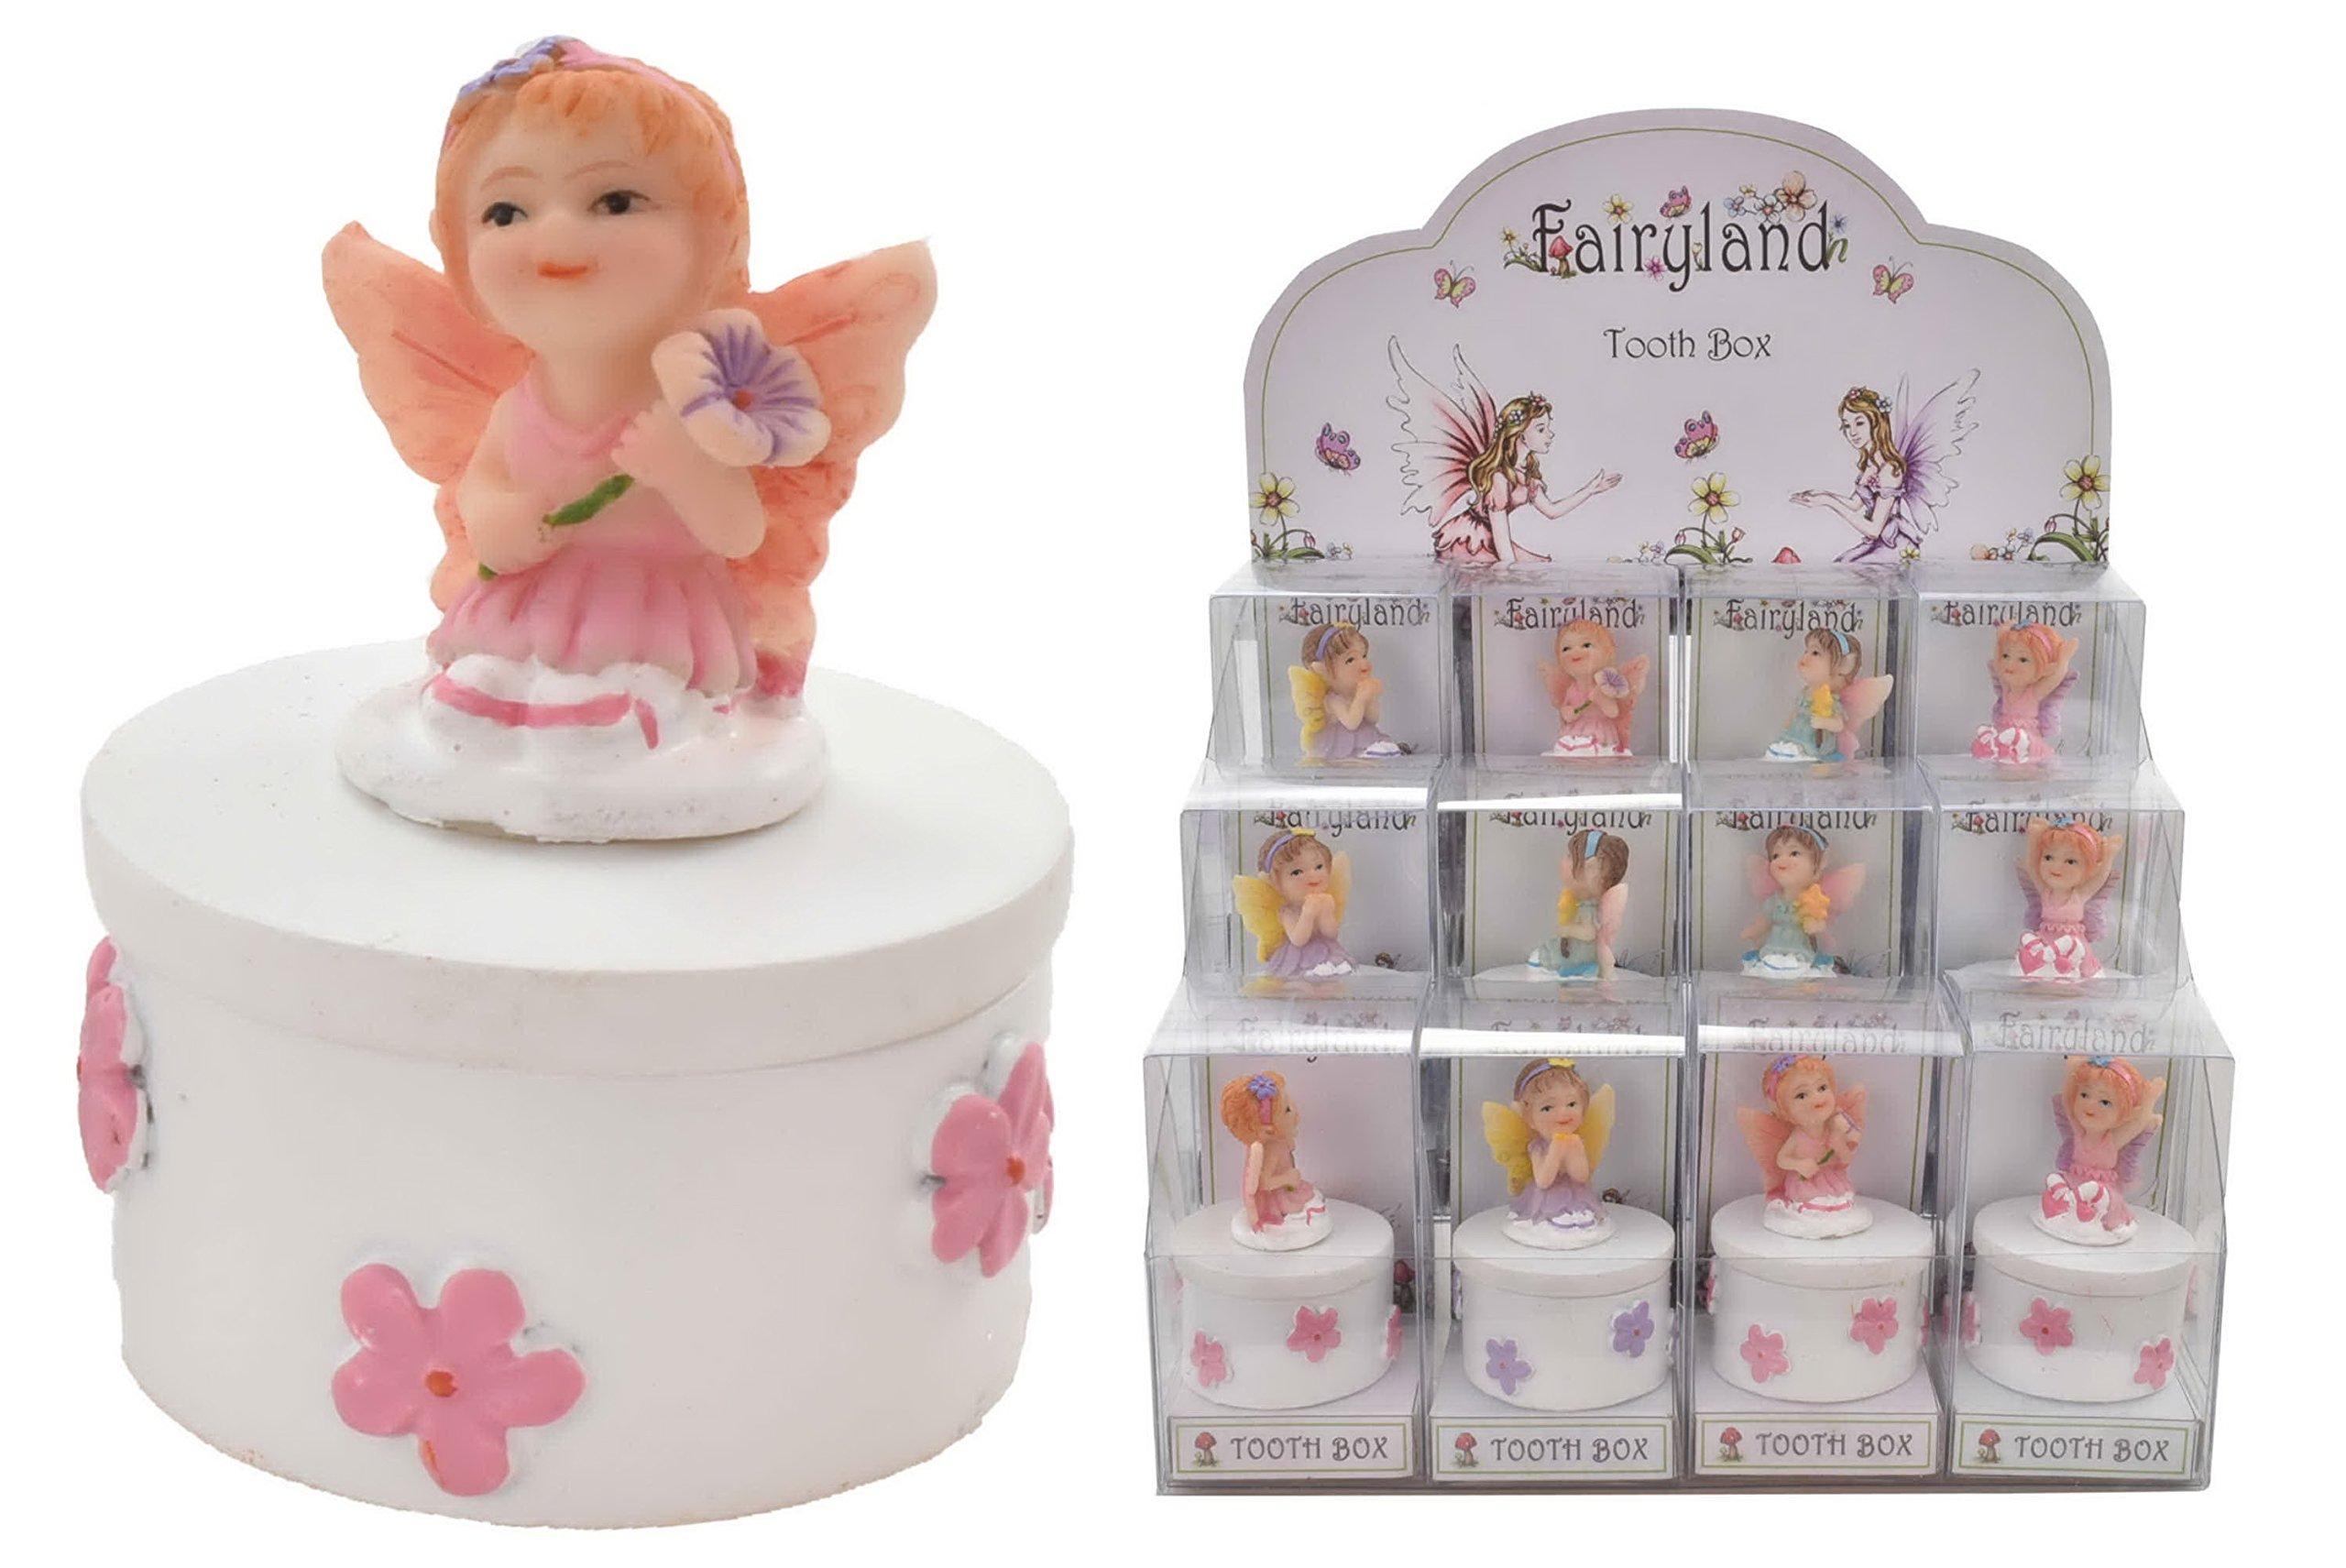 Kids Save Milk Teeth Wood Storage Box B 12.5x11.5x3cm Baby Lanugo Collection Souvenir Box Winkey Tooth Box Organizer for Baby